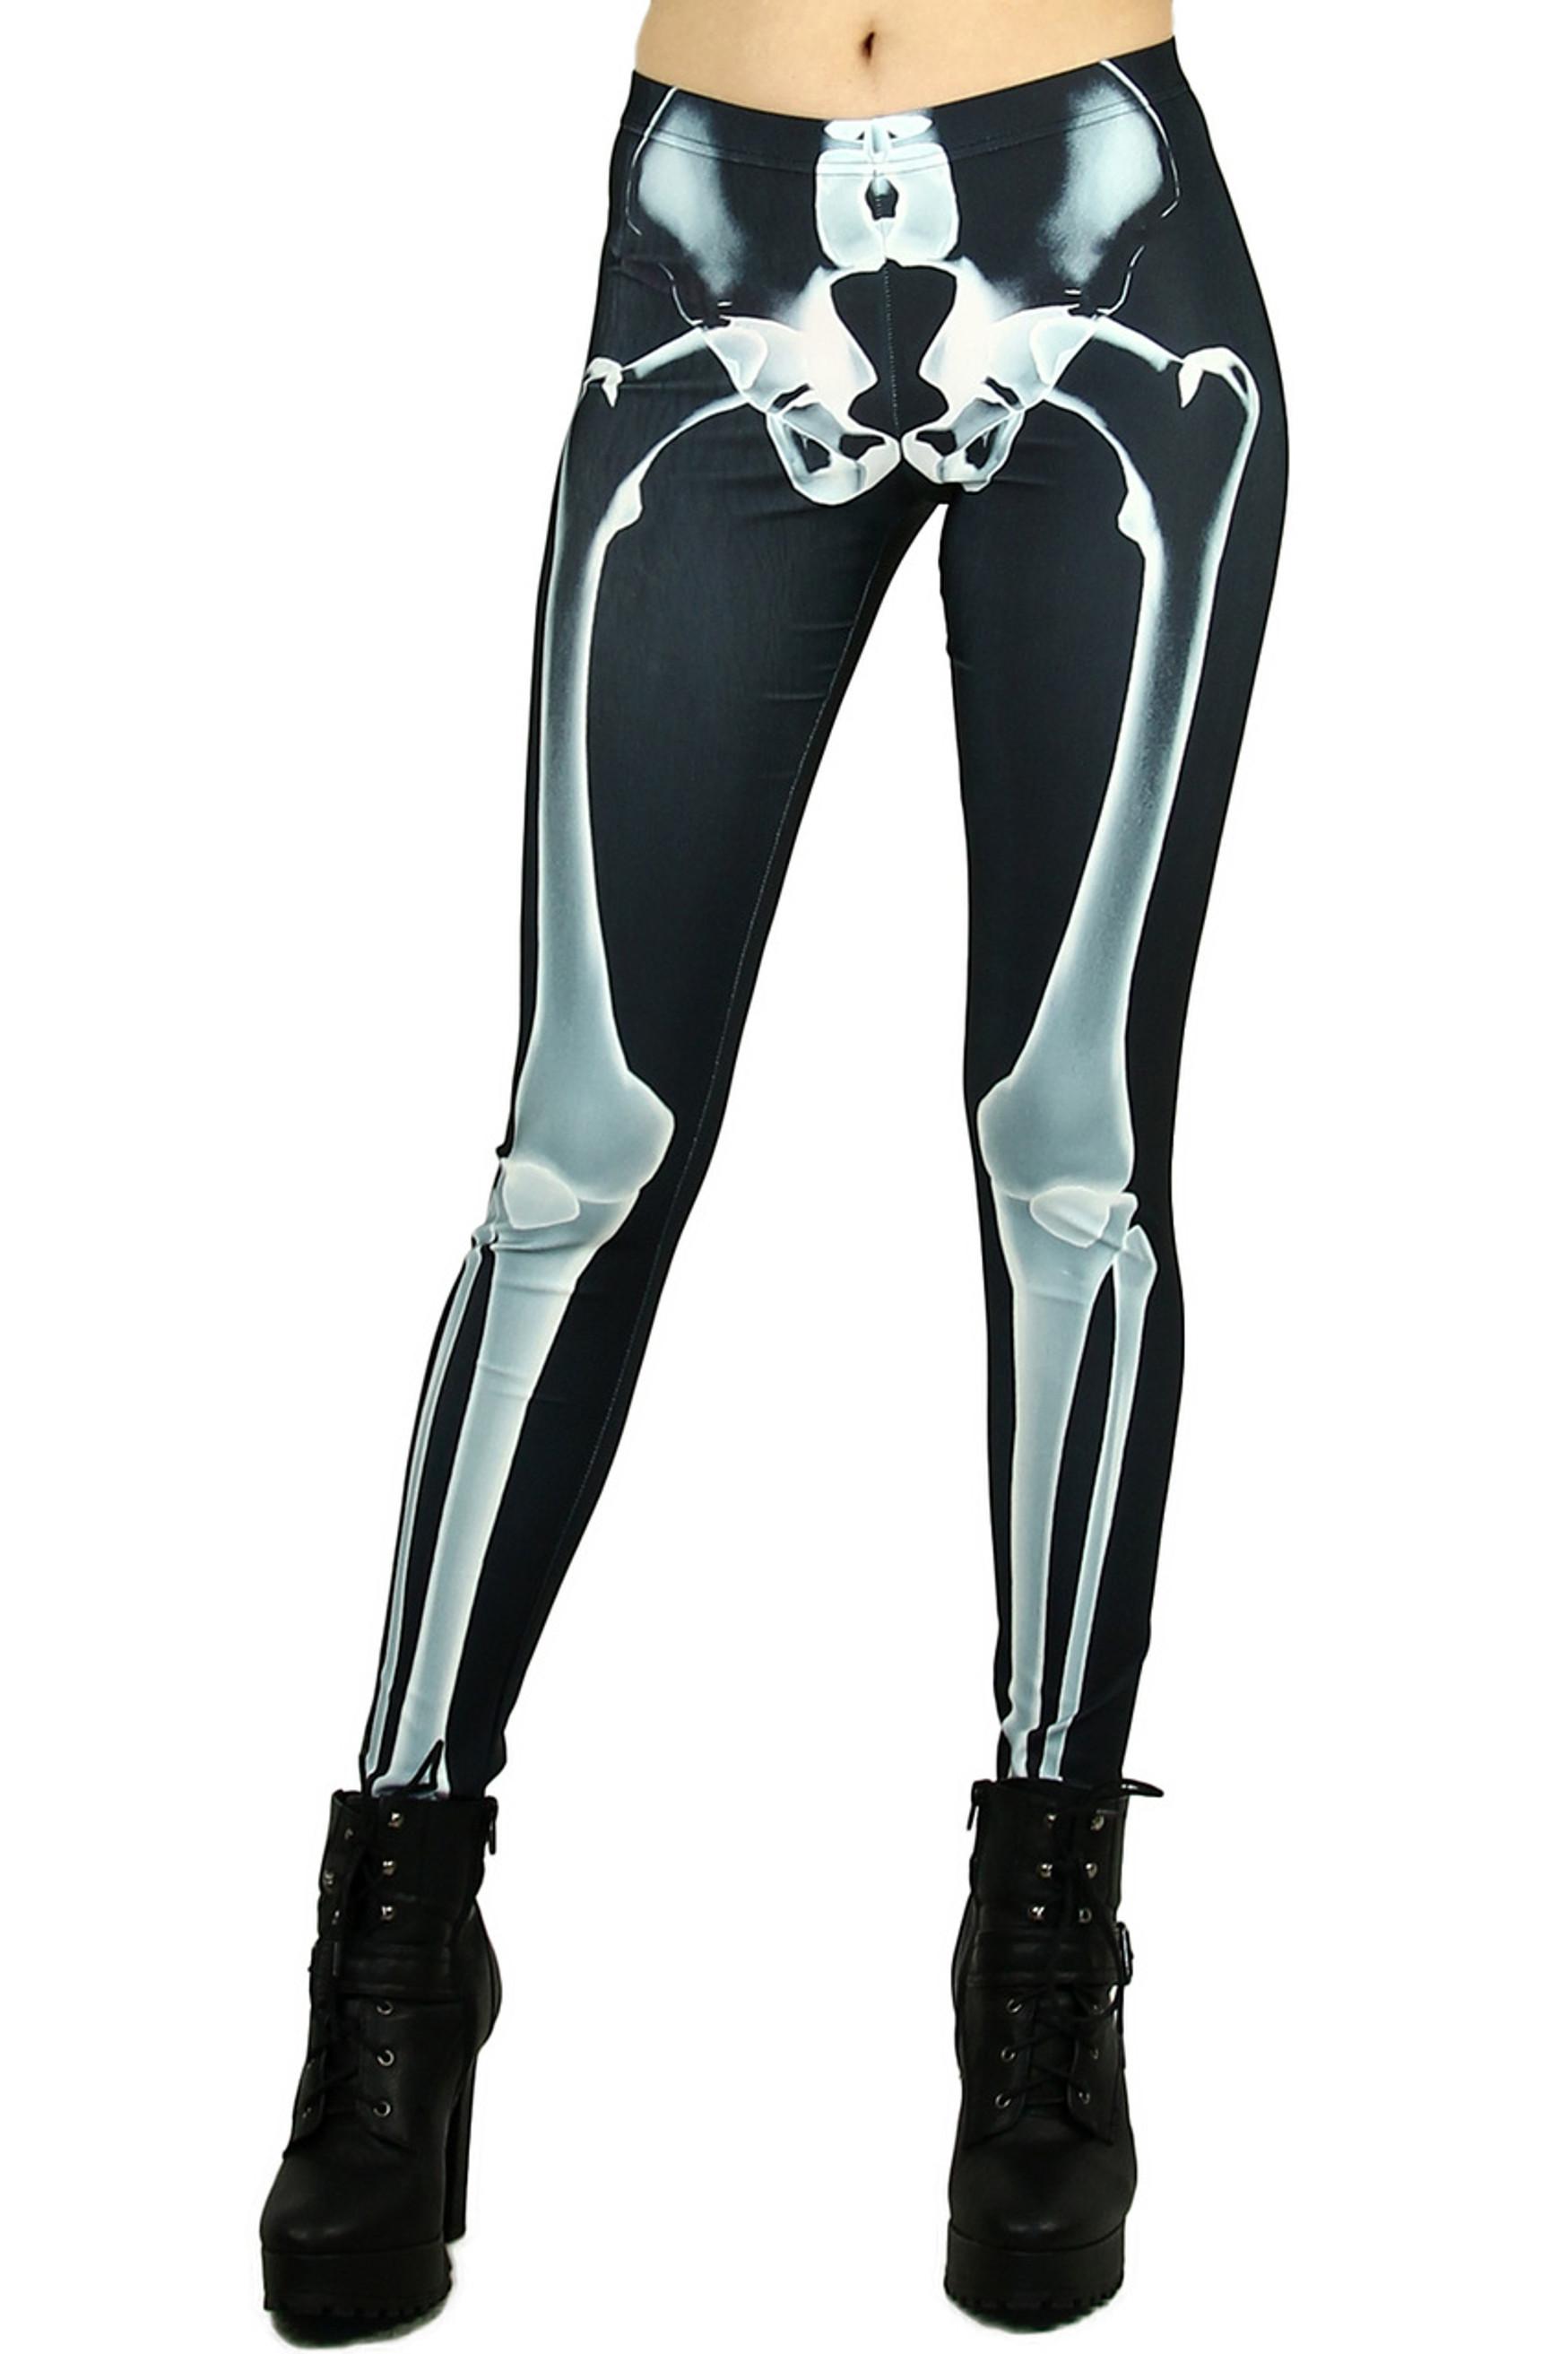 X-Ray Skeleton Leggings